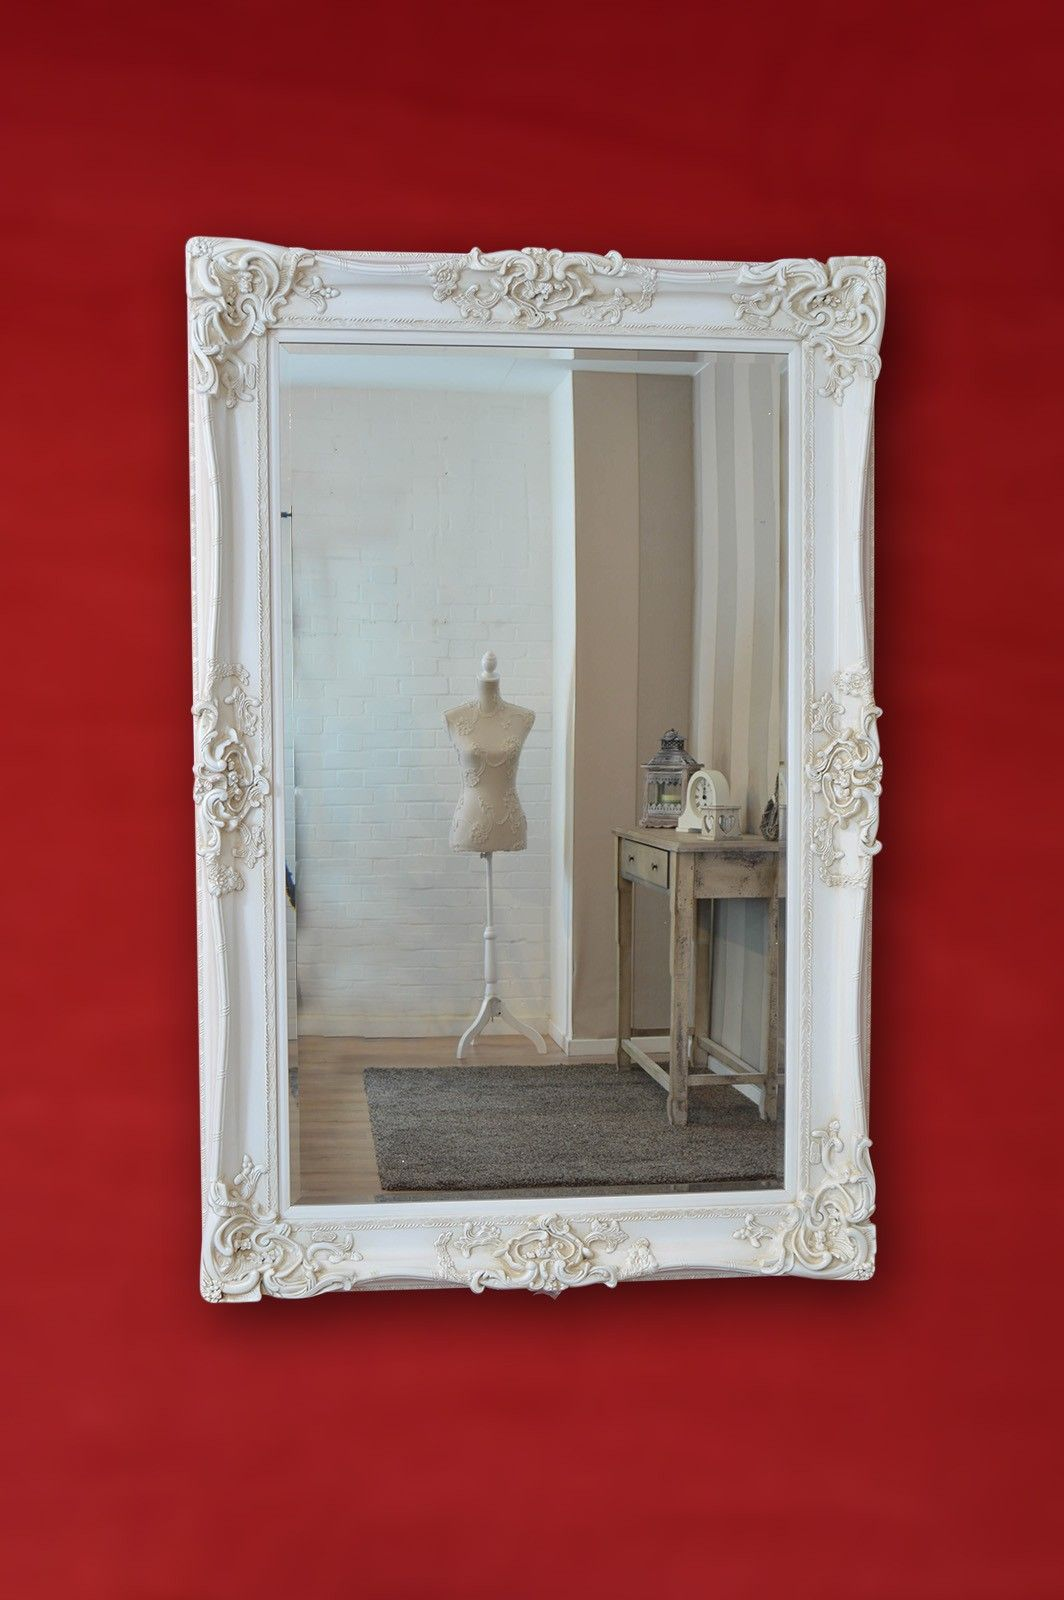 Large Ivory Ornate Frame Antique Design Big Wall Mirror